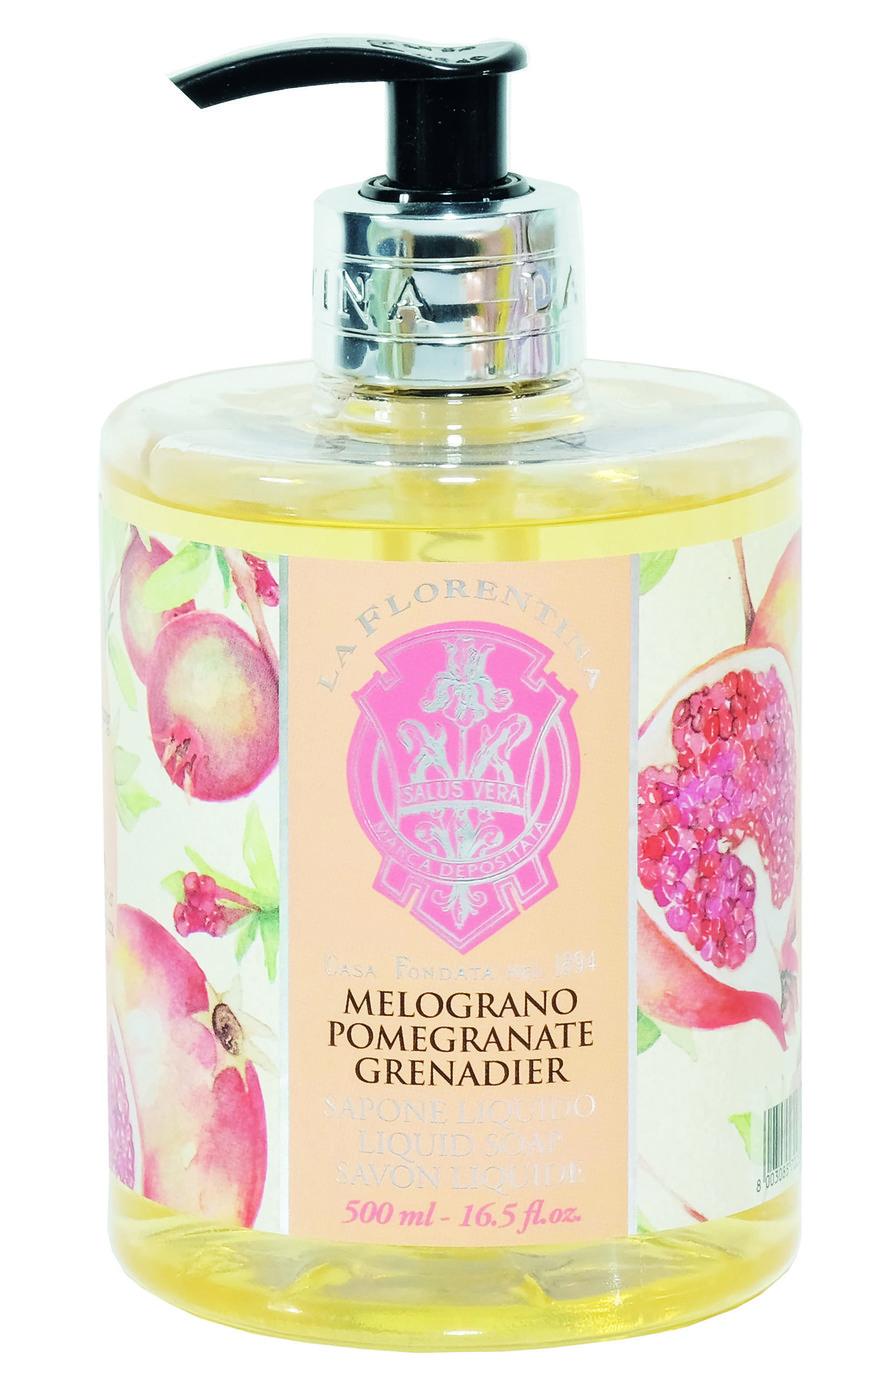 La FlorentinaЖидкое мыло Pomegranate / Гранат 500 ml Коллекция: ГРАНАТ / BELLOSGUARDO COLLECTIONС...